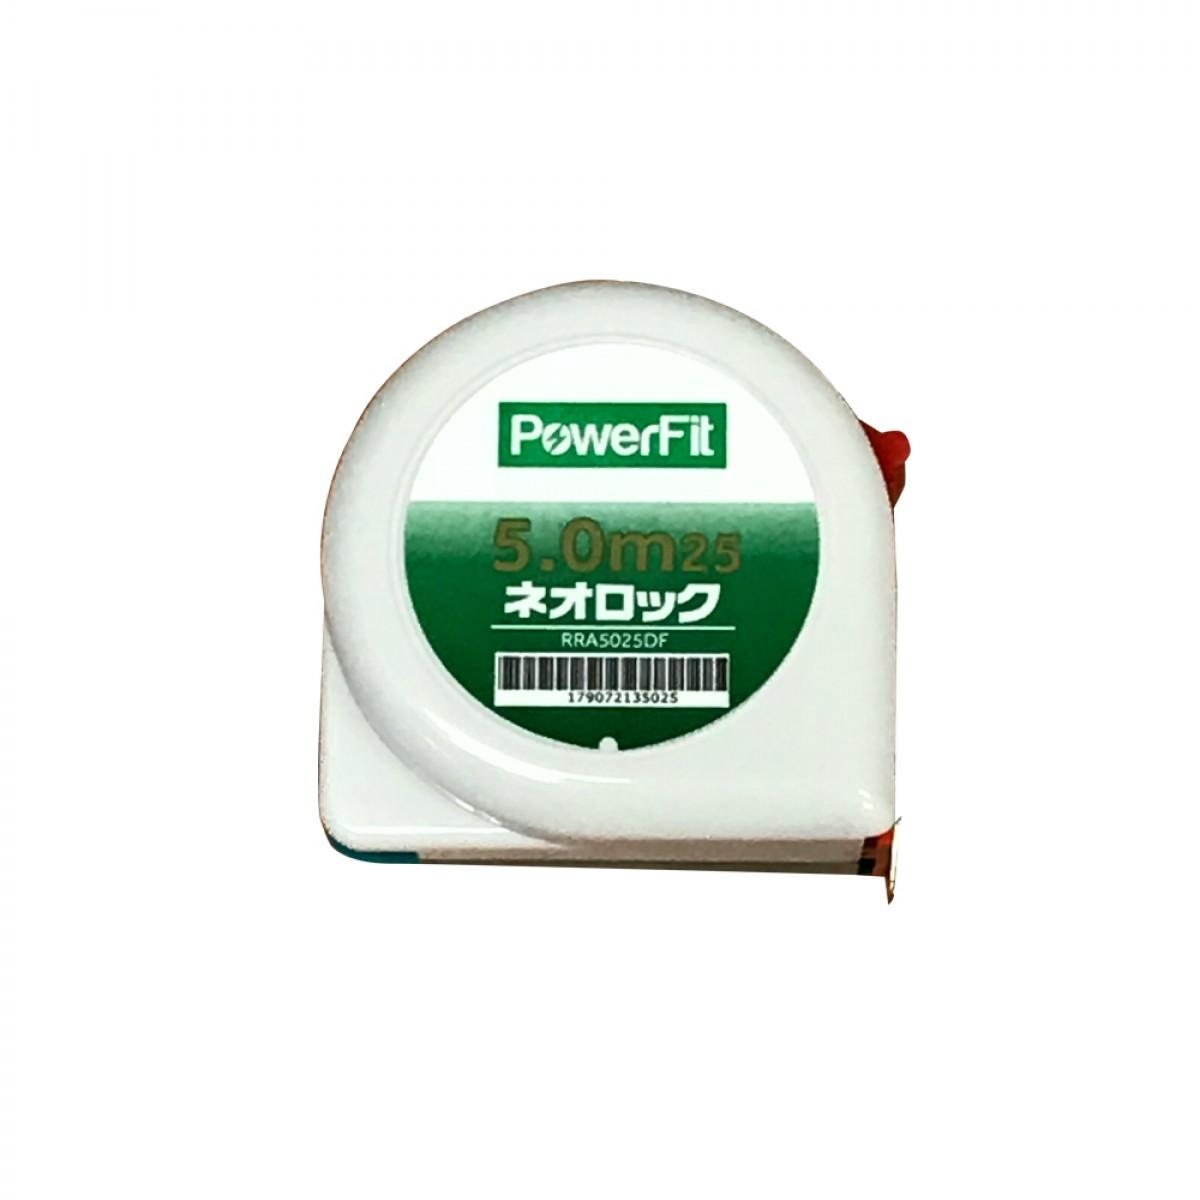 (Promo:Buy 12 Get 1 FREE) POWERFIT GEOMETRIC MEASURING ...